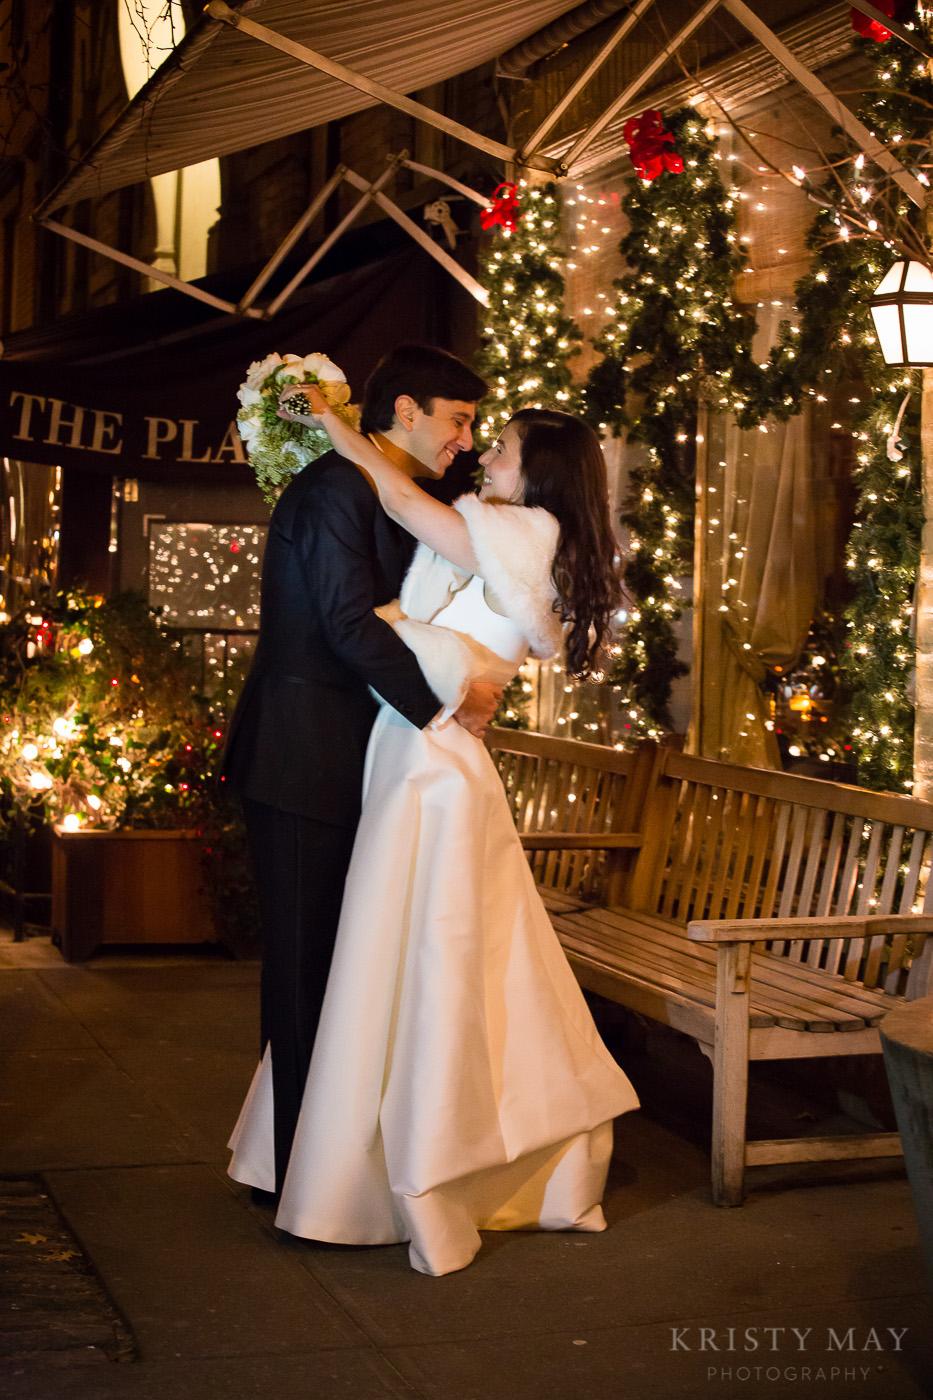 LITTLE_OWL_VENUE_WEDDING_16.jpg